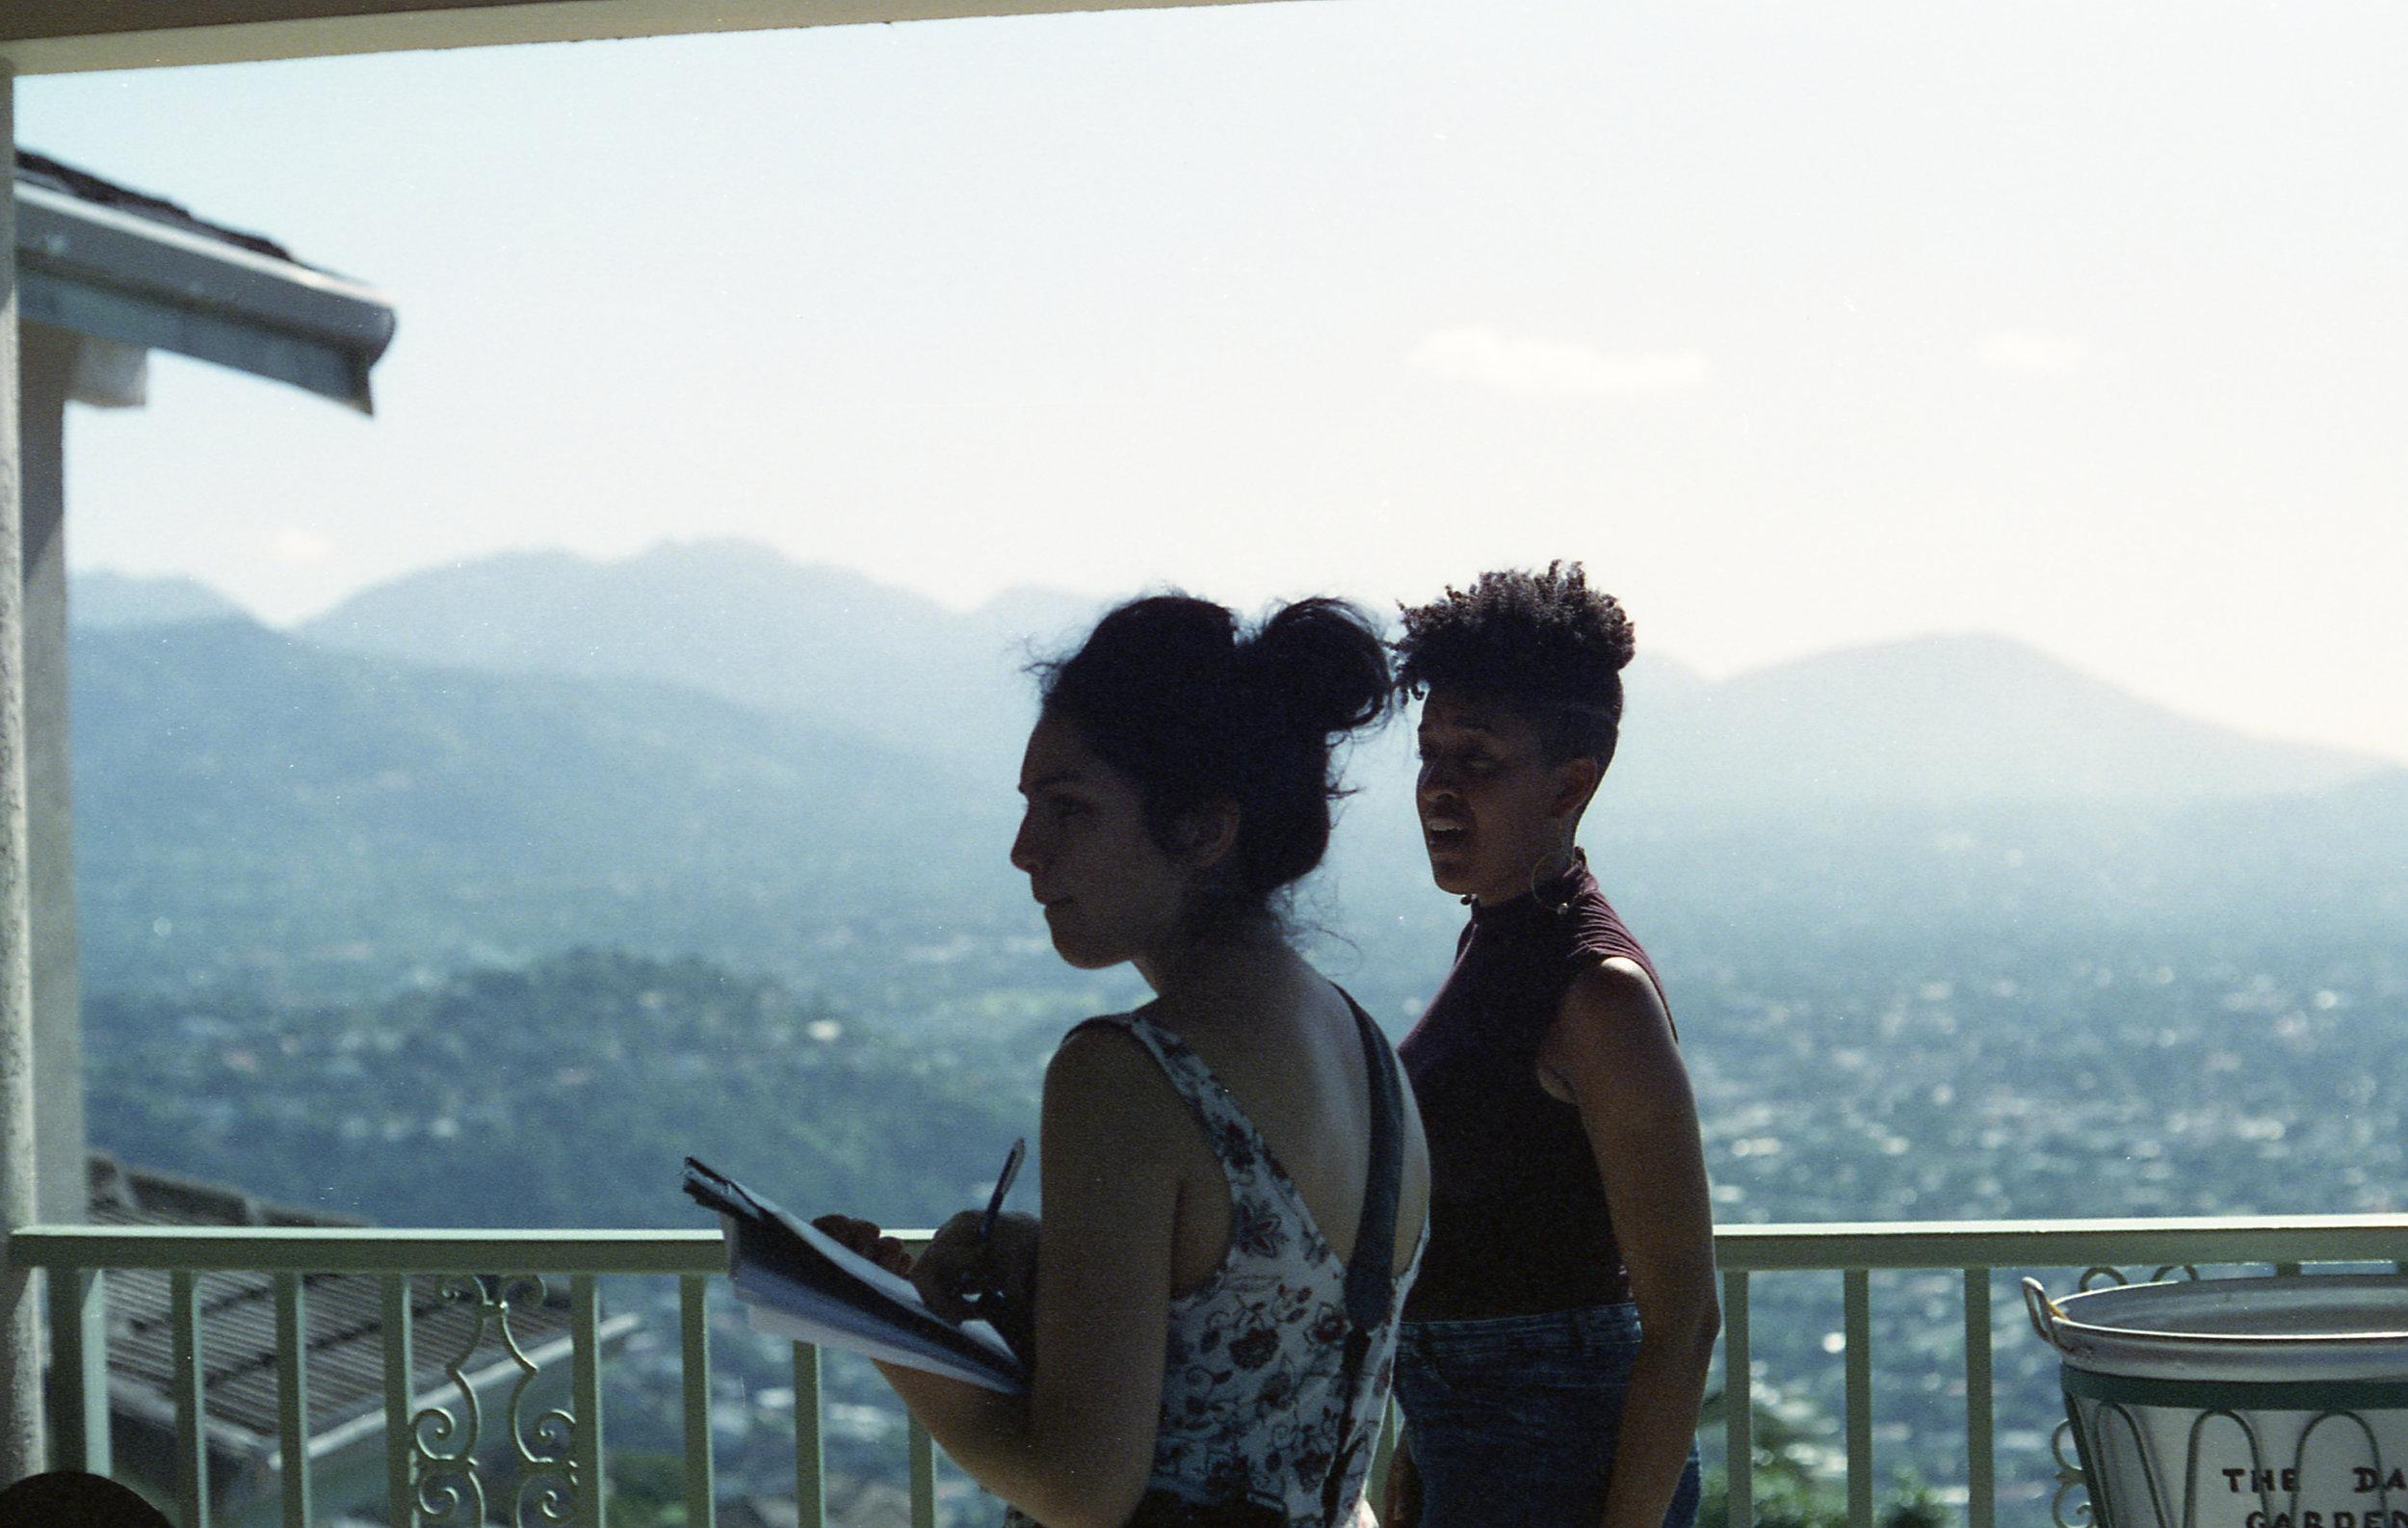 Sontenish and Cinematographer Zamarin Wahdat planning the shots for the balcony scene.